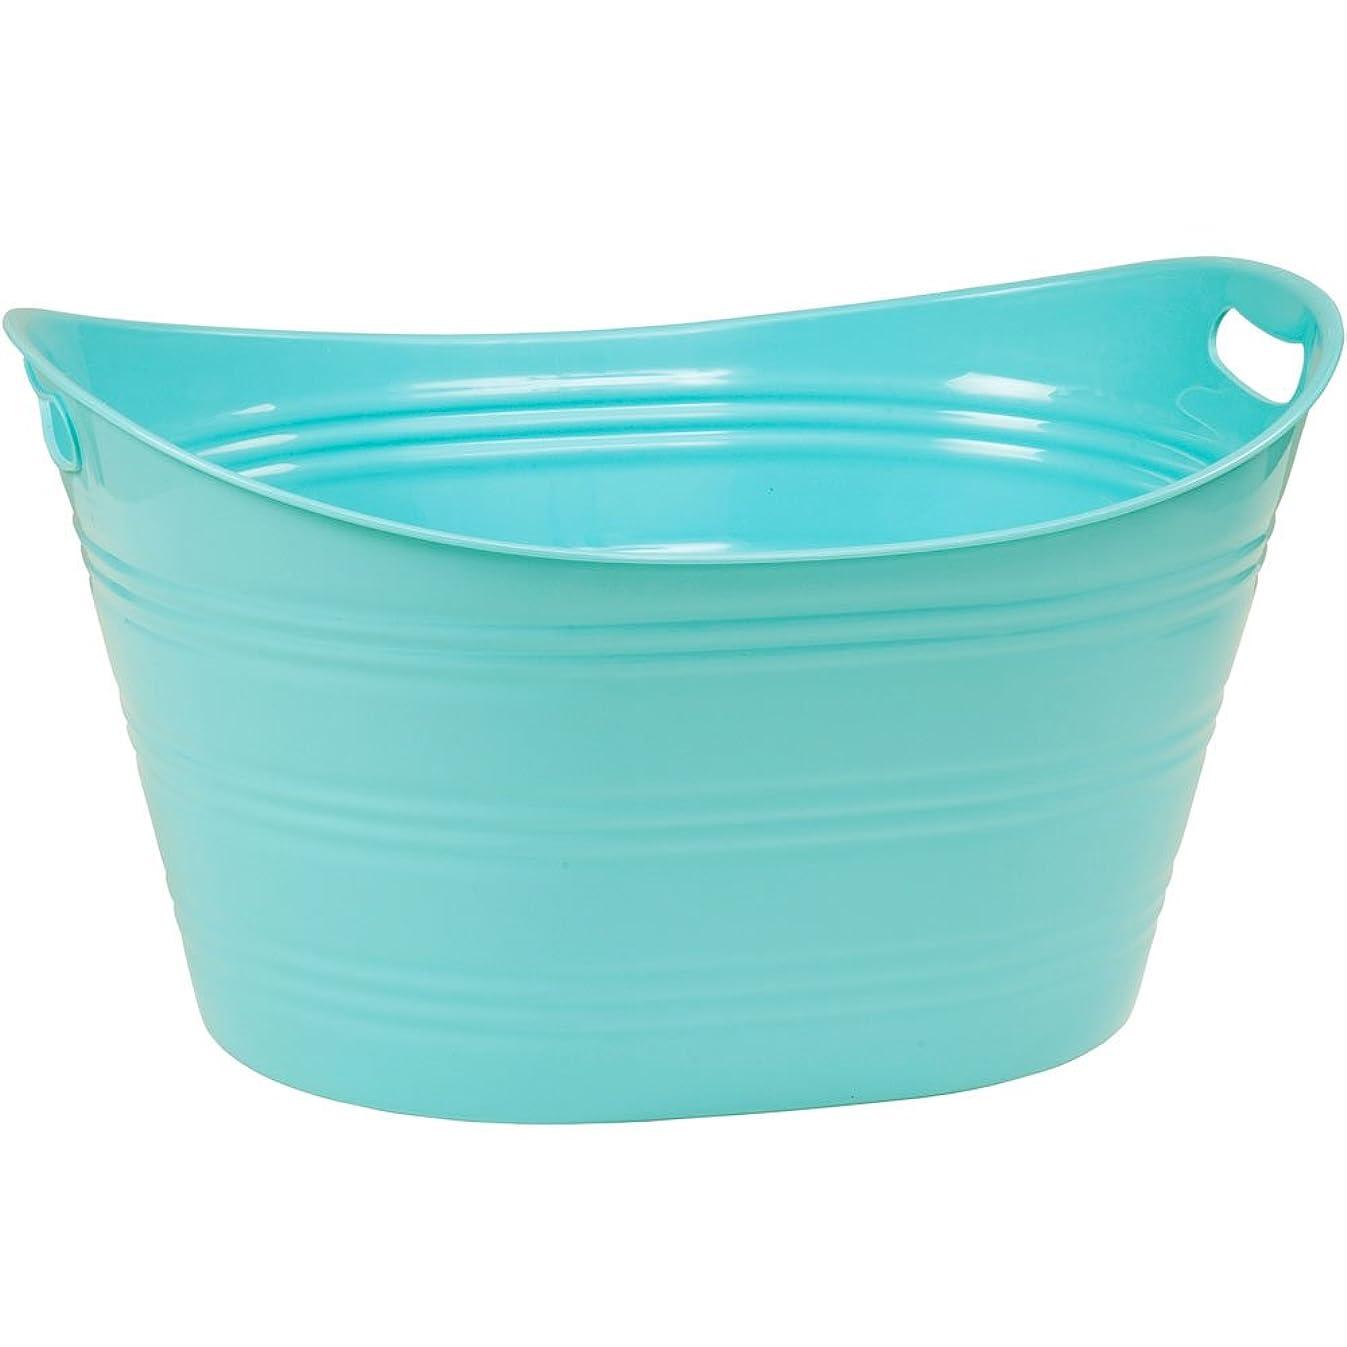 CreativeWare PTUB-PB Powder Blue 8.5 Gallon Party Tub,